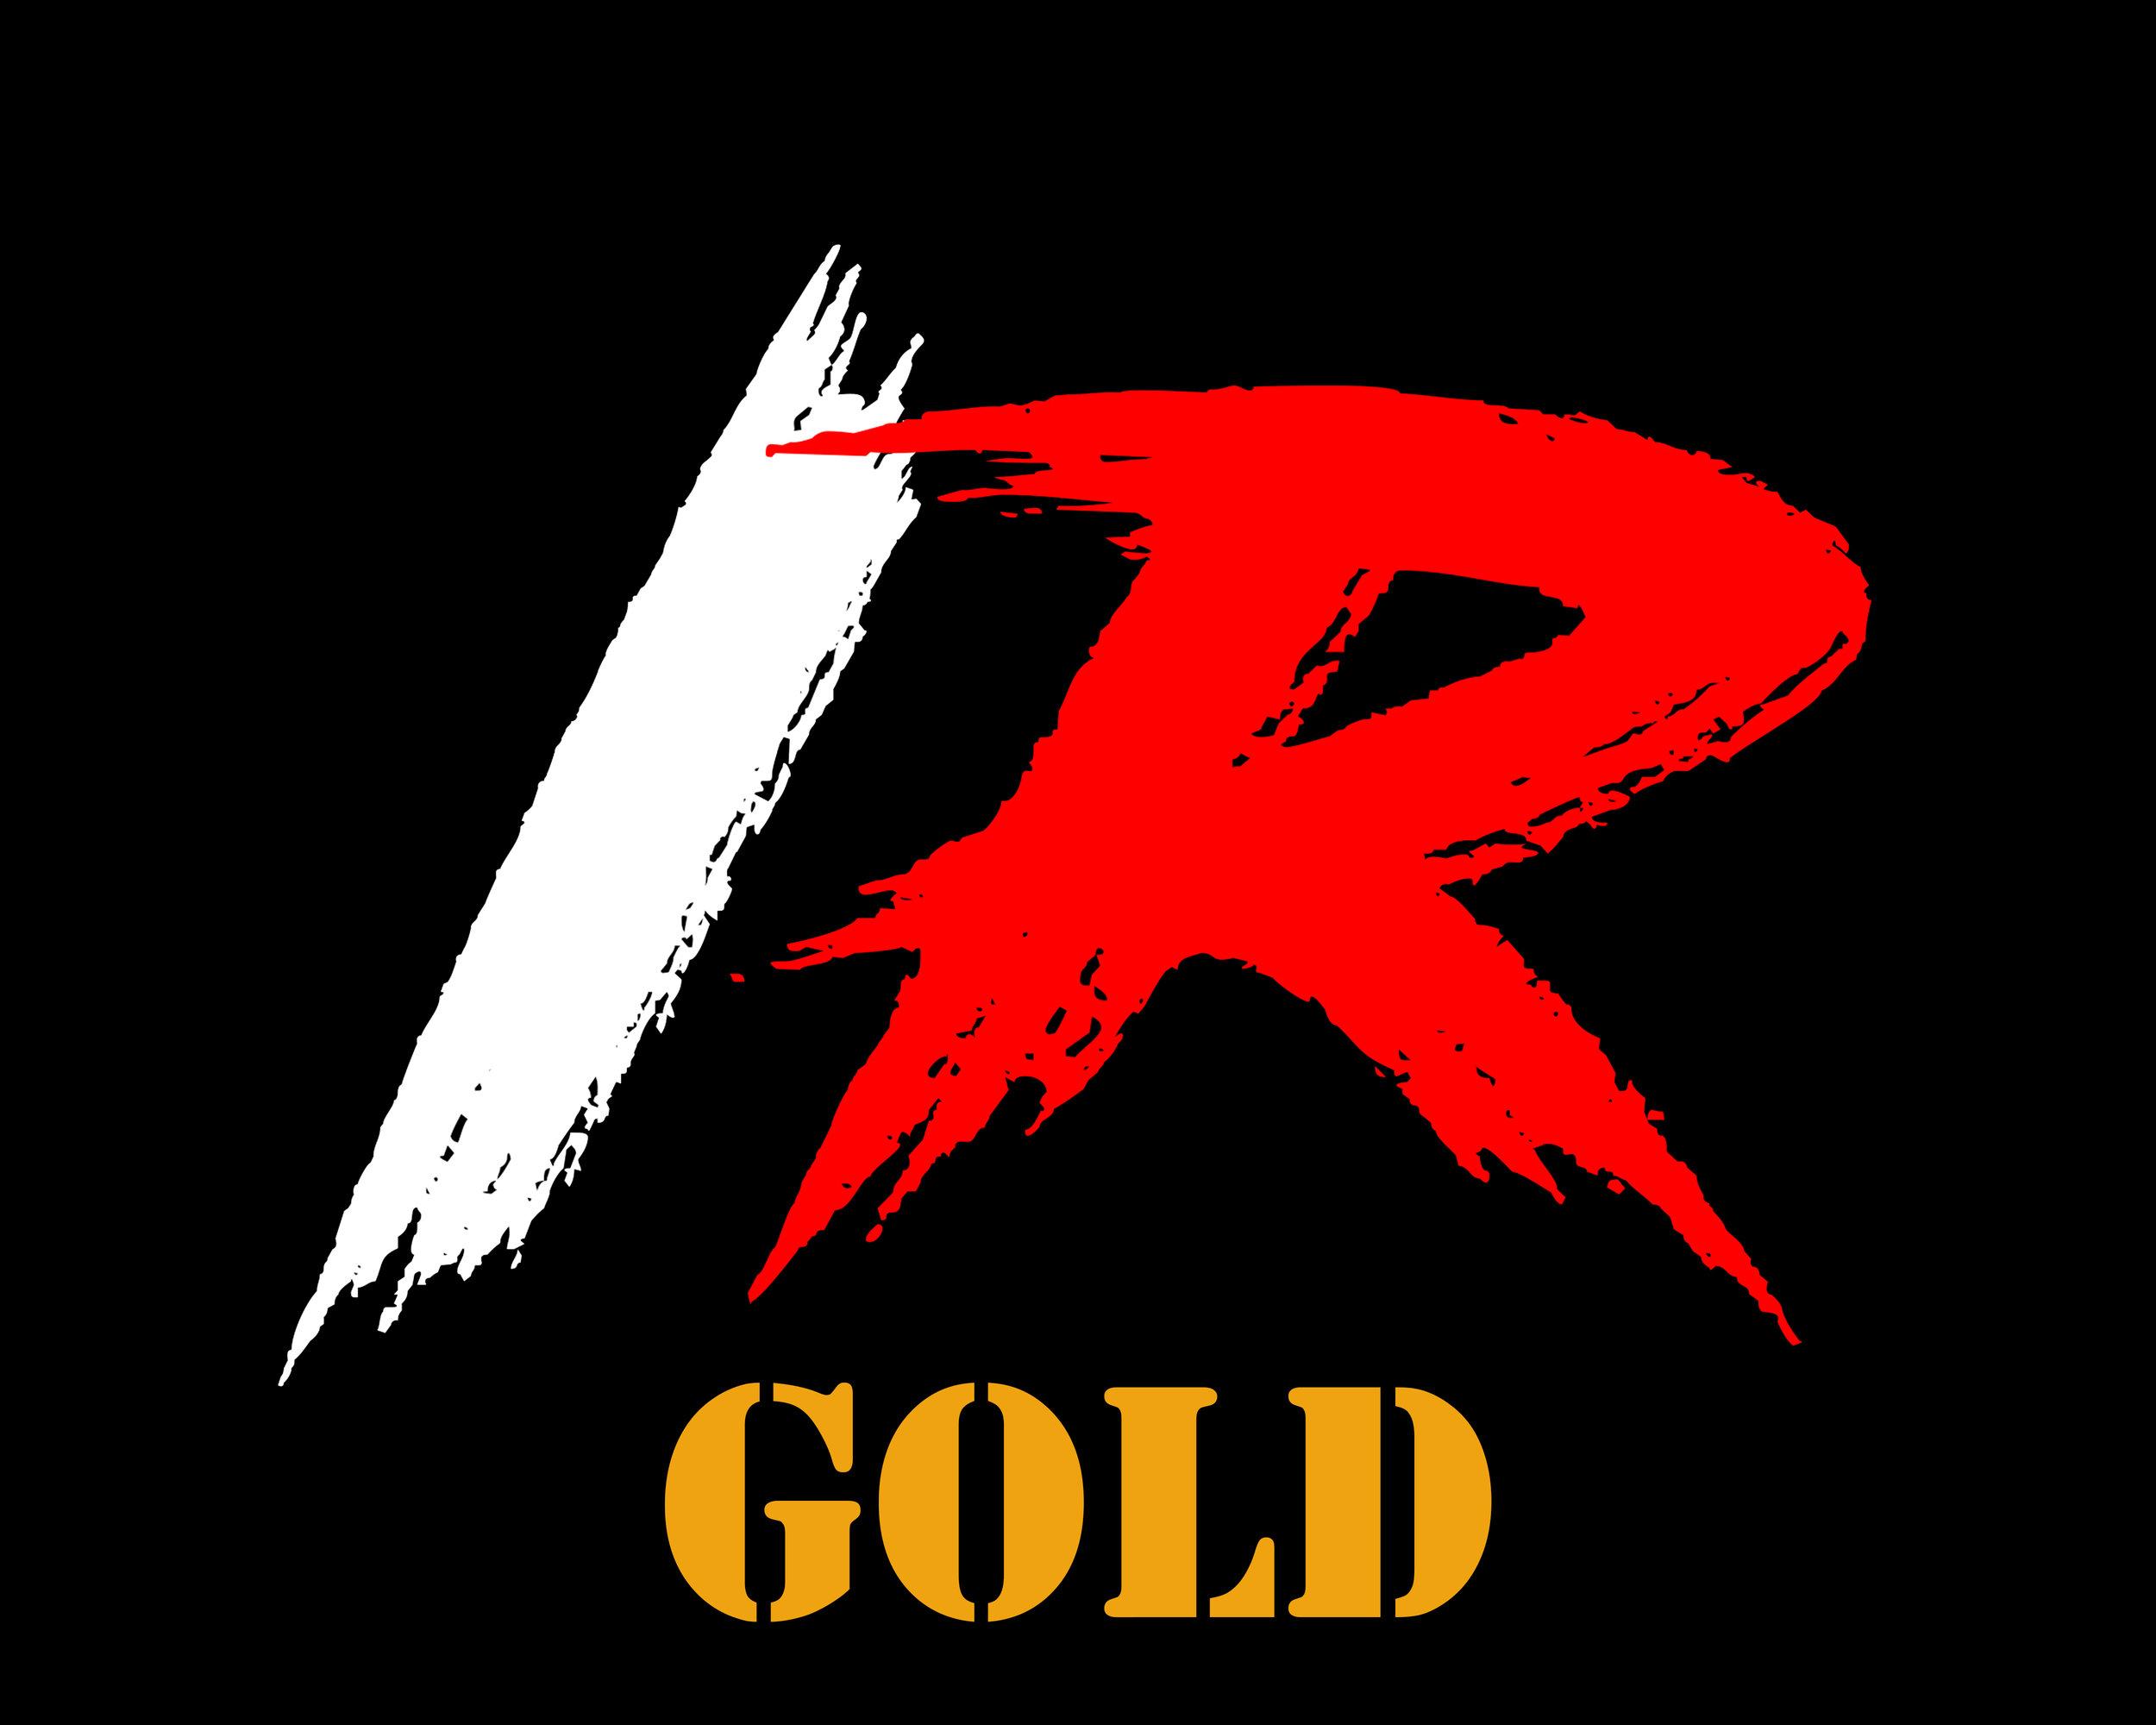 Supporter PackTier 3 (Gold) - $150.00